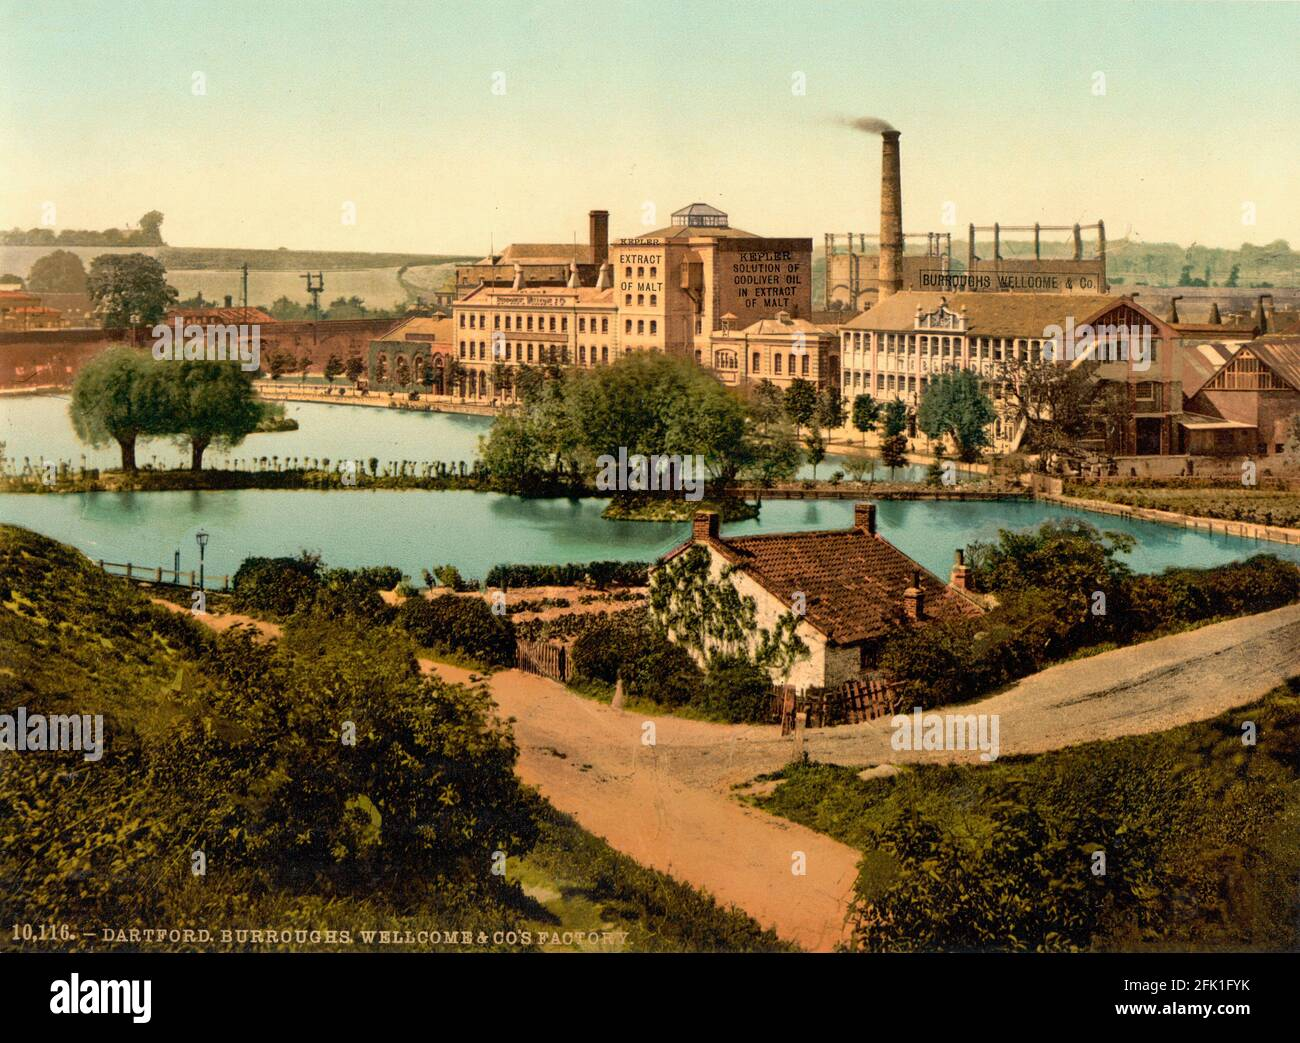 Burroughs e Wellcome fabbrica di medicina a Dartford, Kent circa 1890-1900 Foto Stock